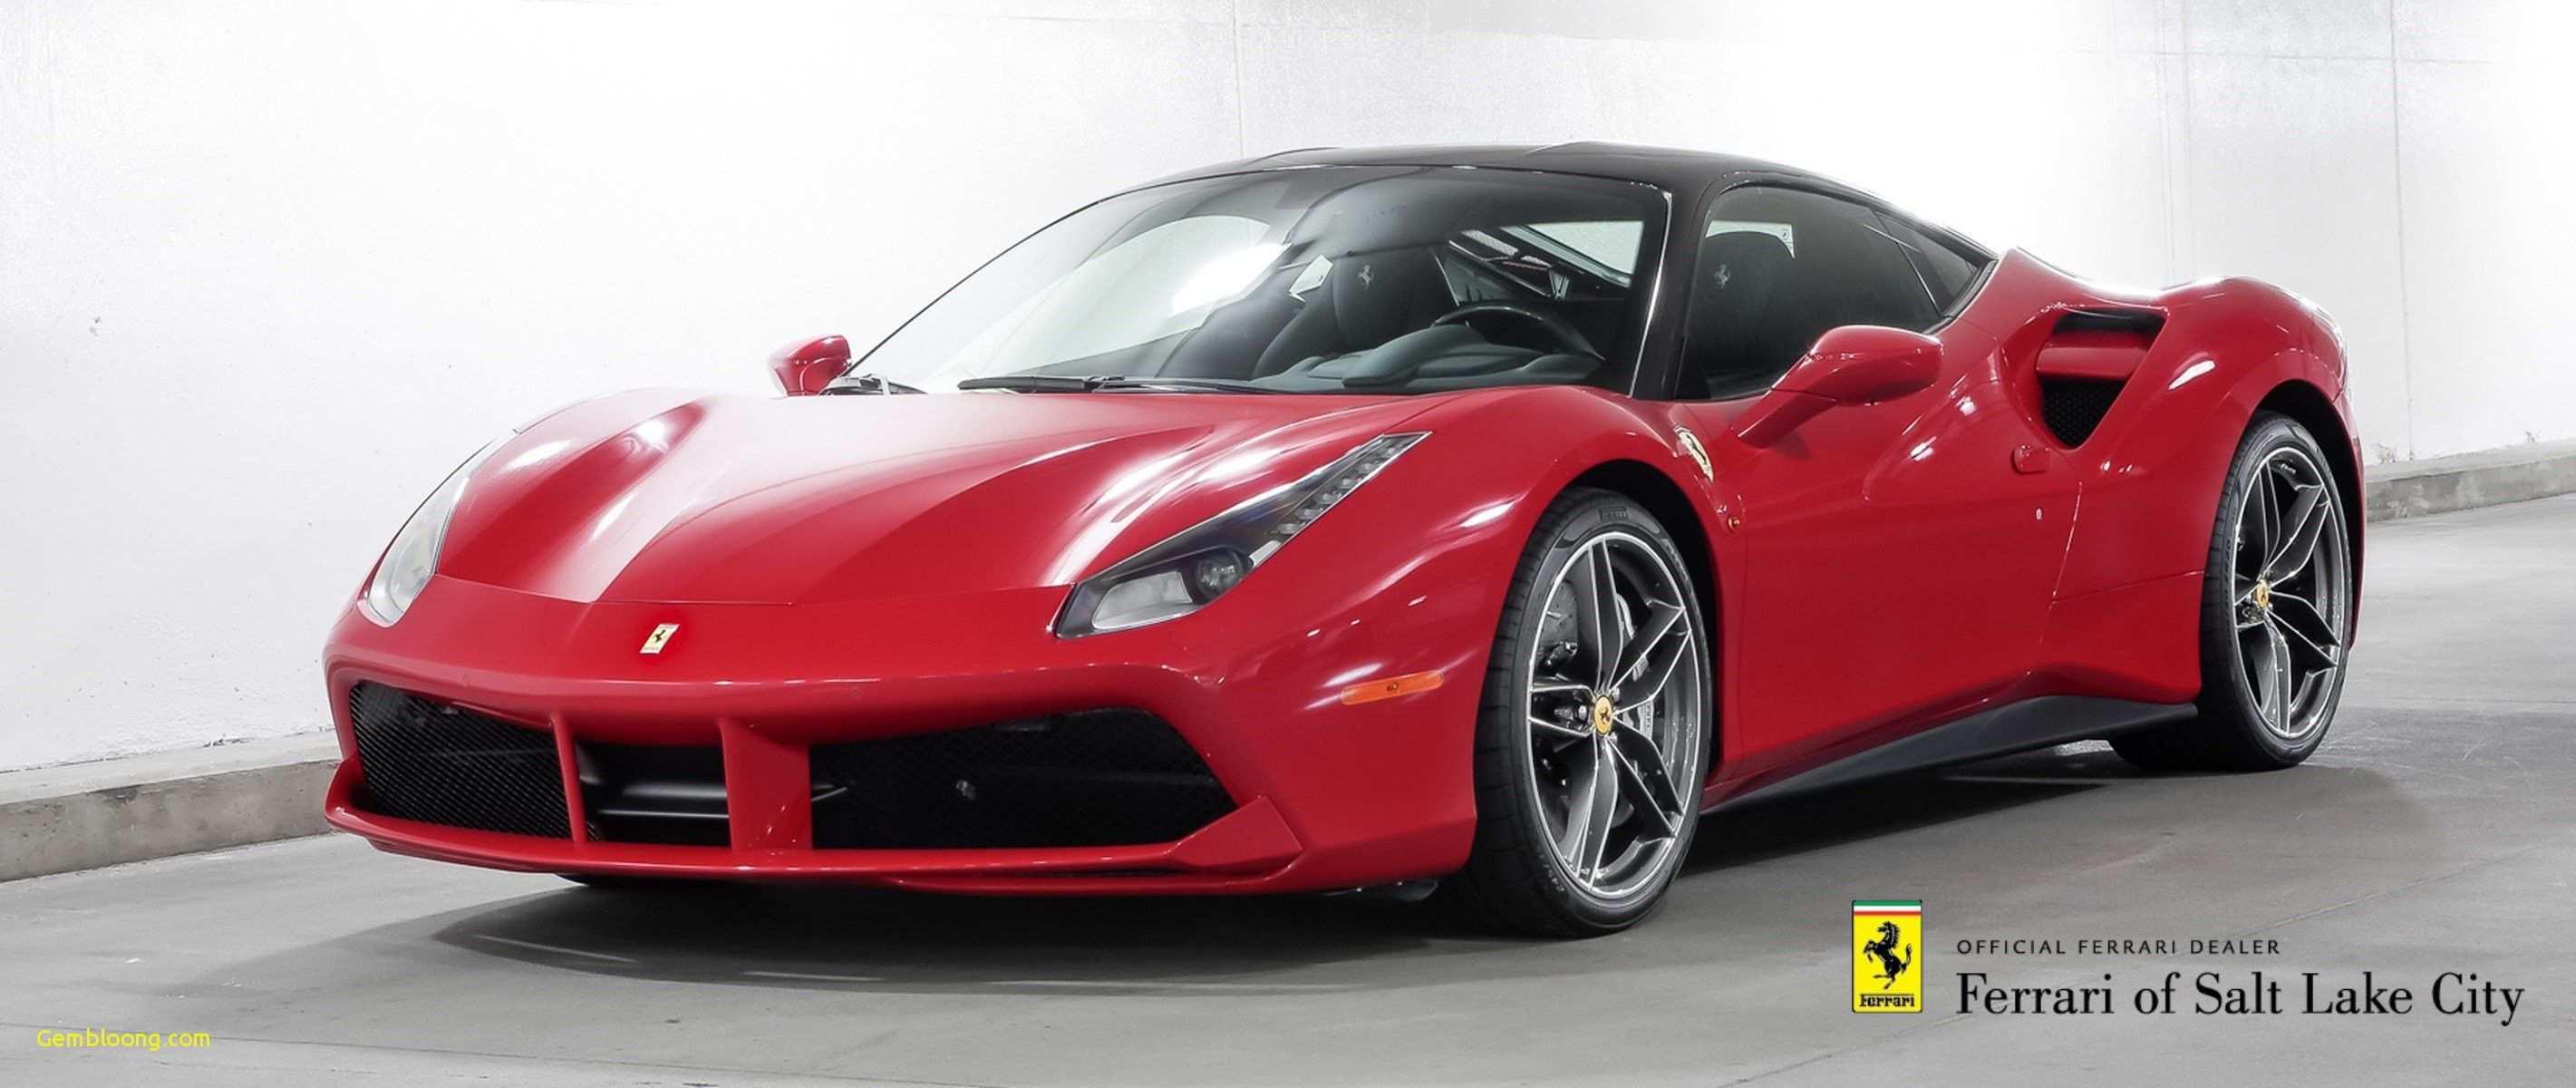 71 Great 2020 Ferrari 488 GTB Performance with 2020 Ferrari 488 GTB